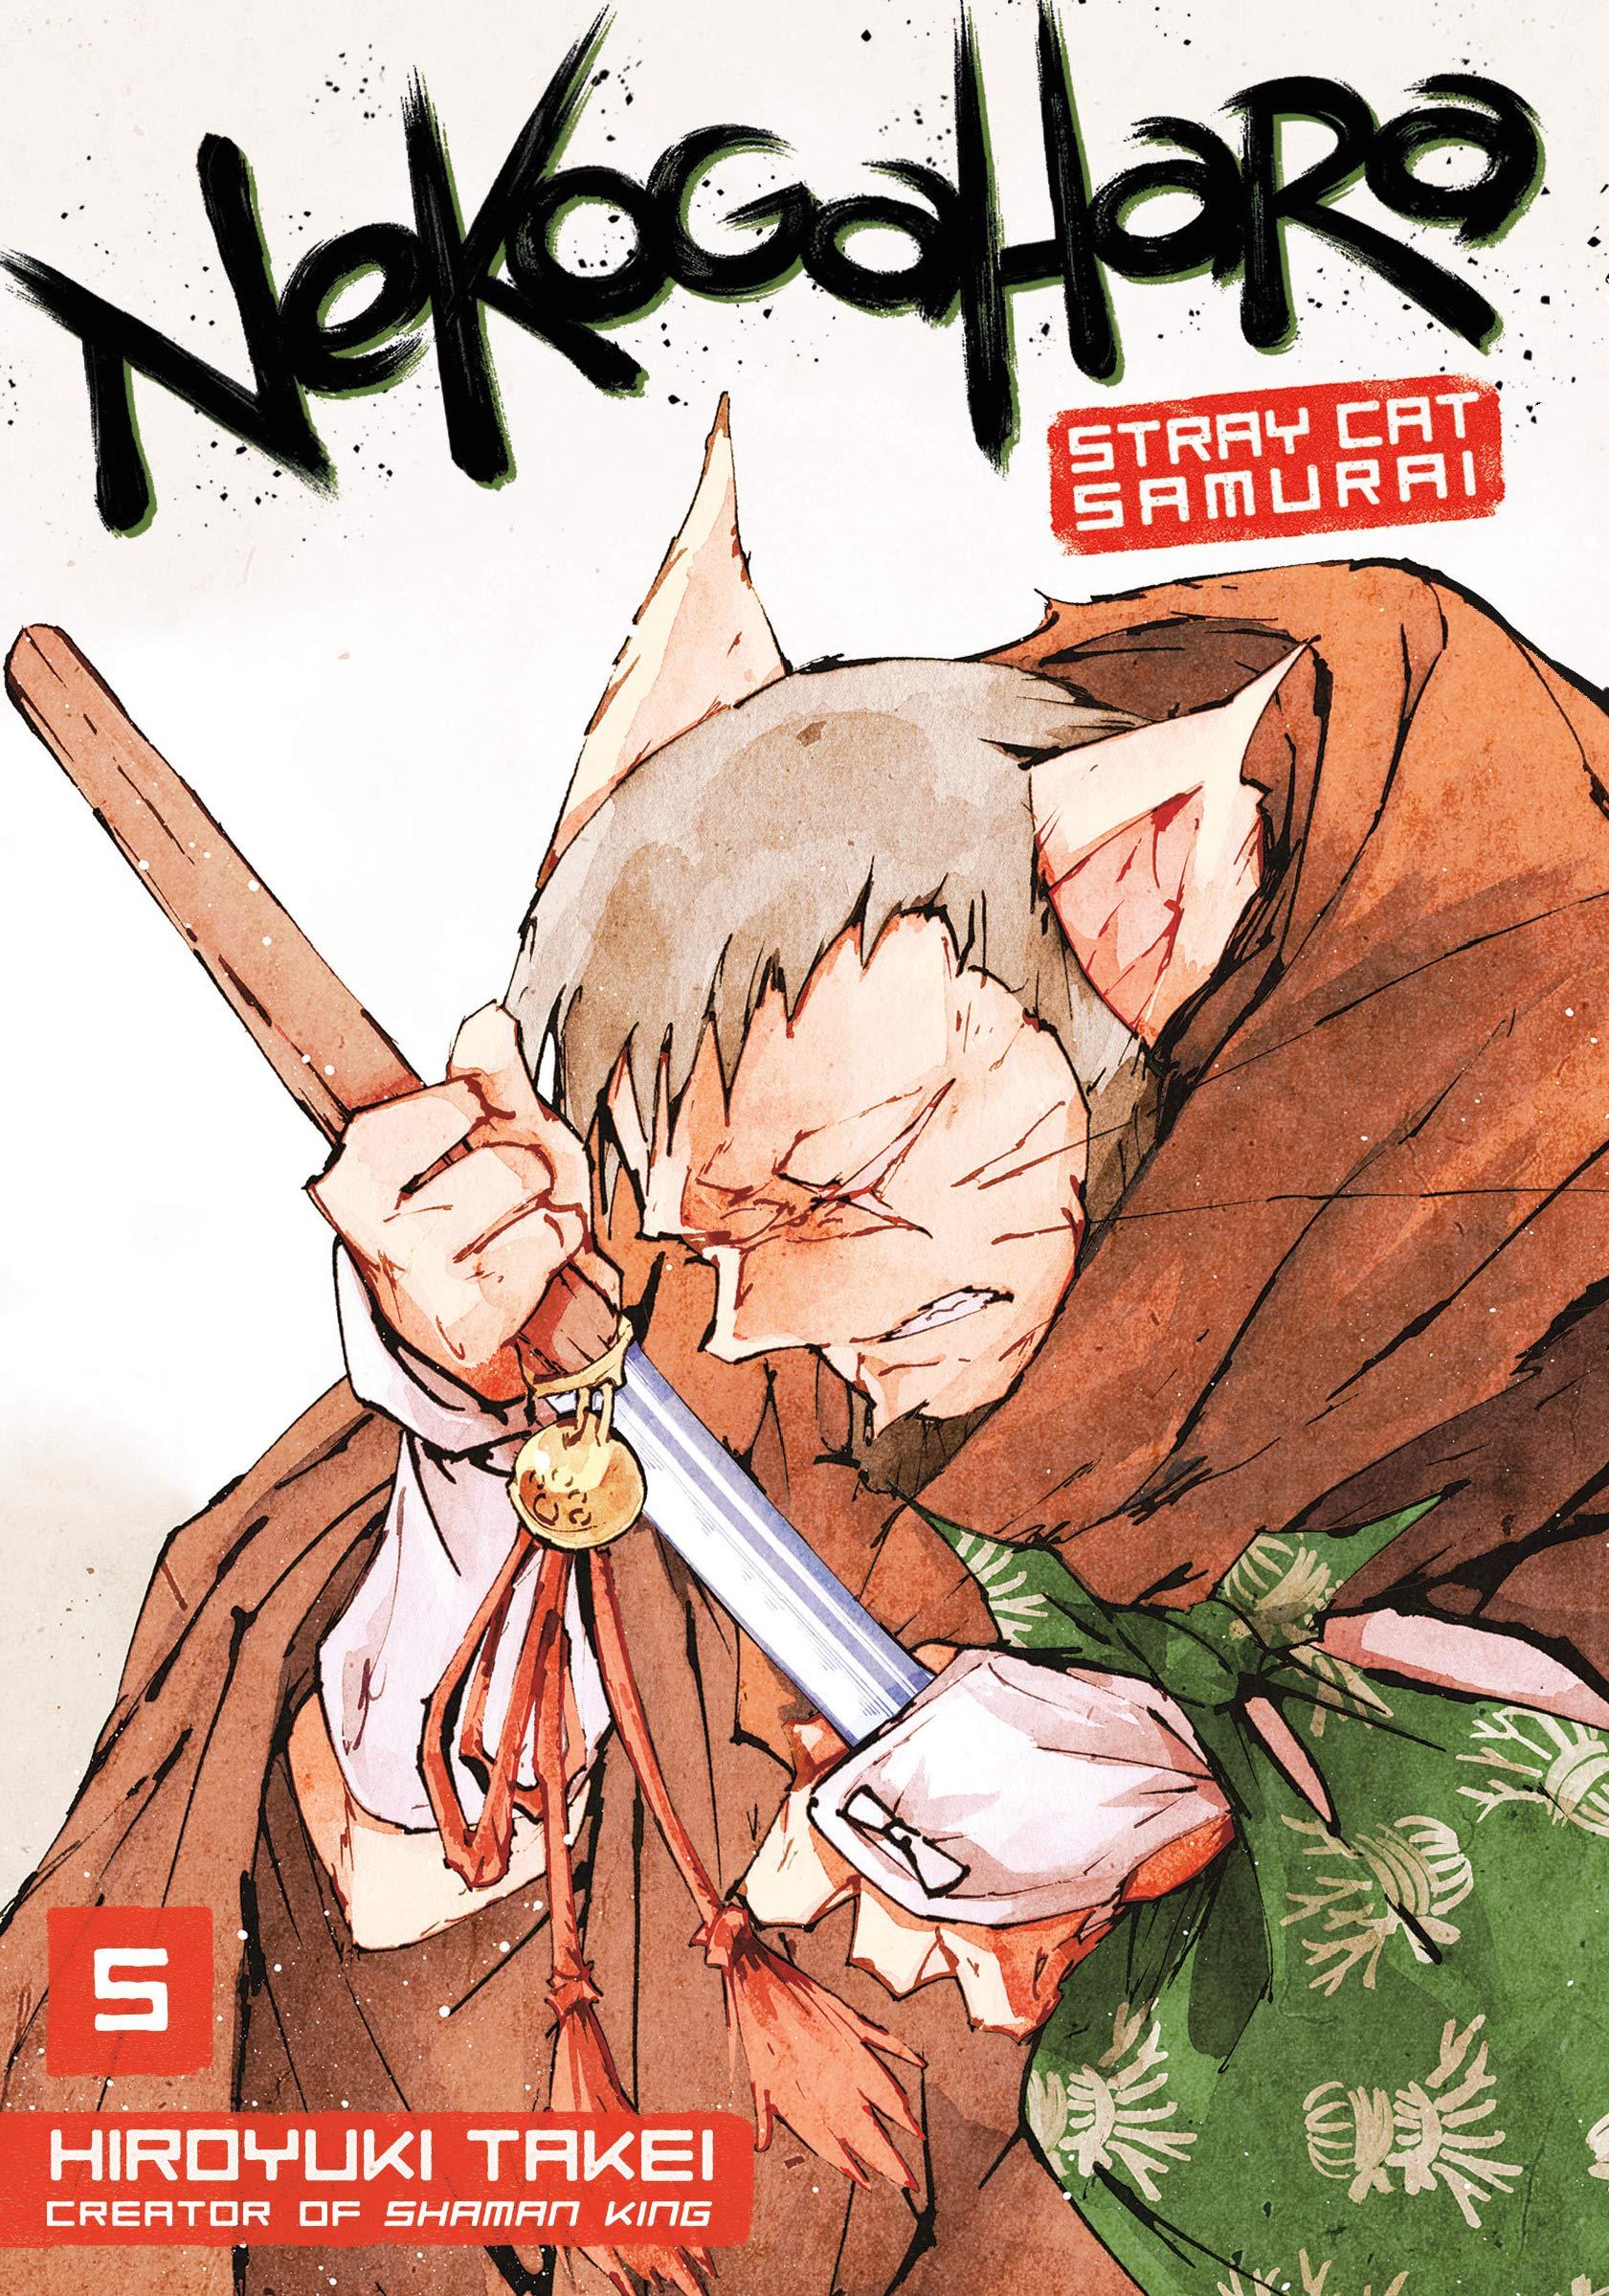 Nekogahara: Stray Cat Samurai, vol. 5 thumbnail